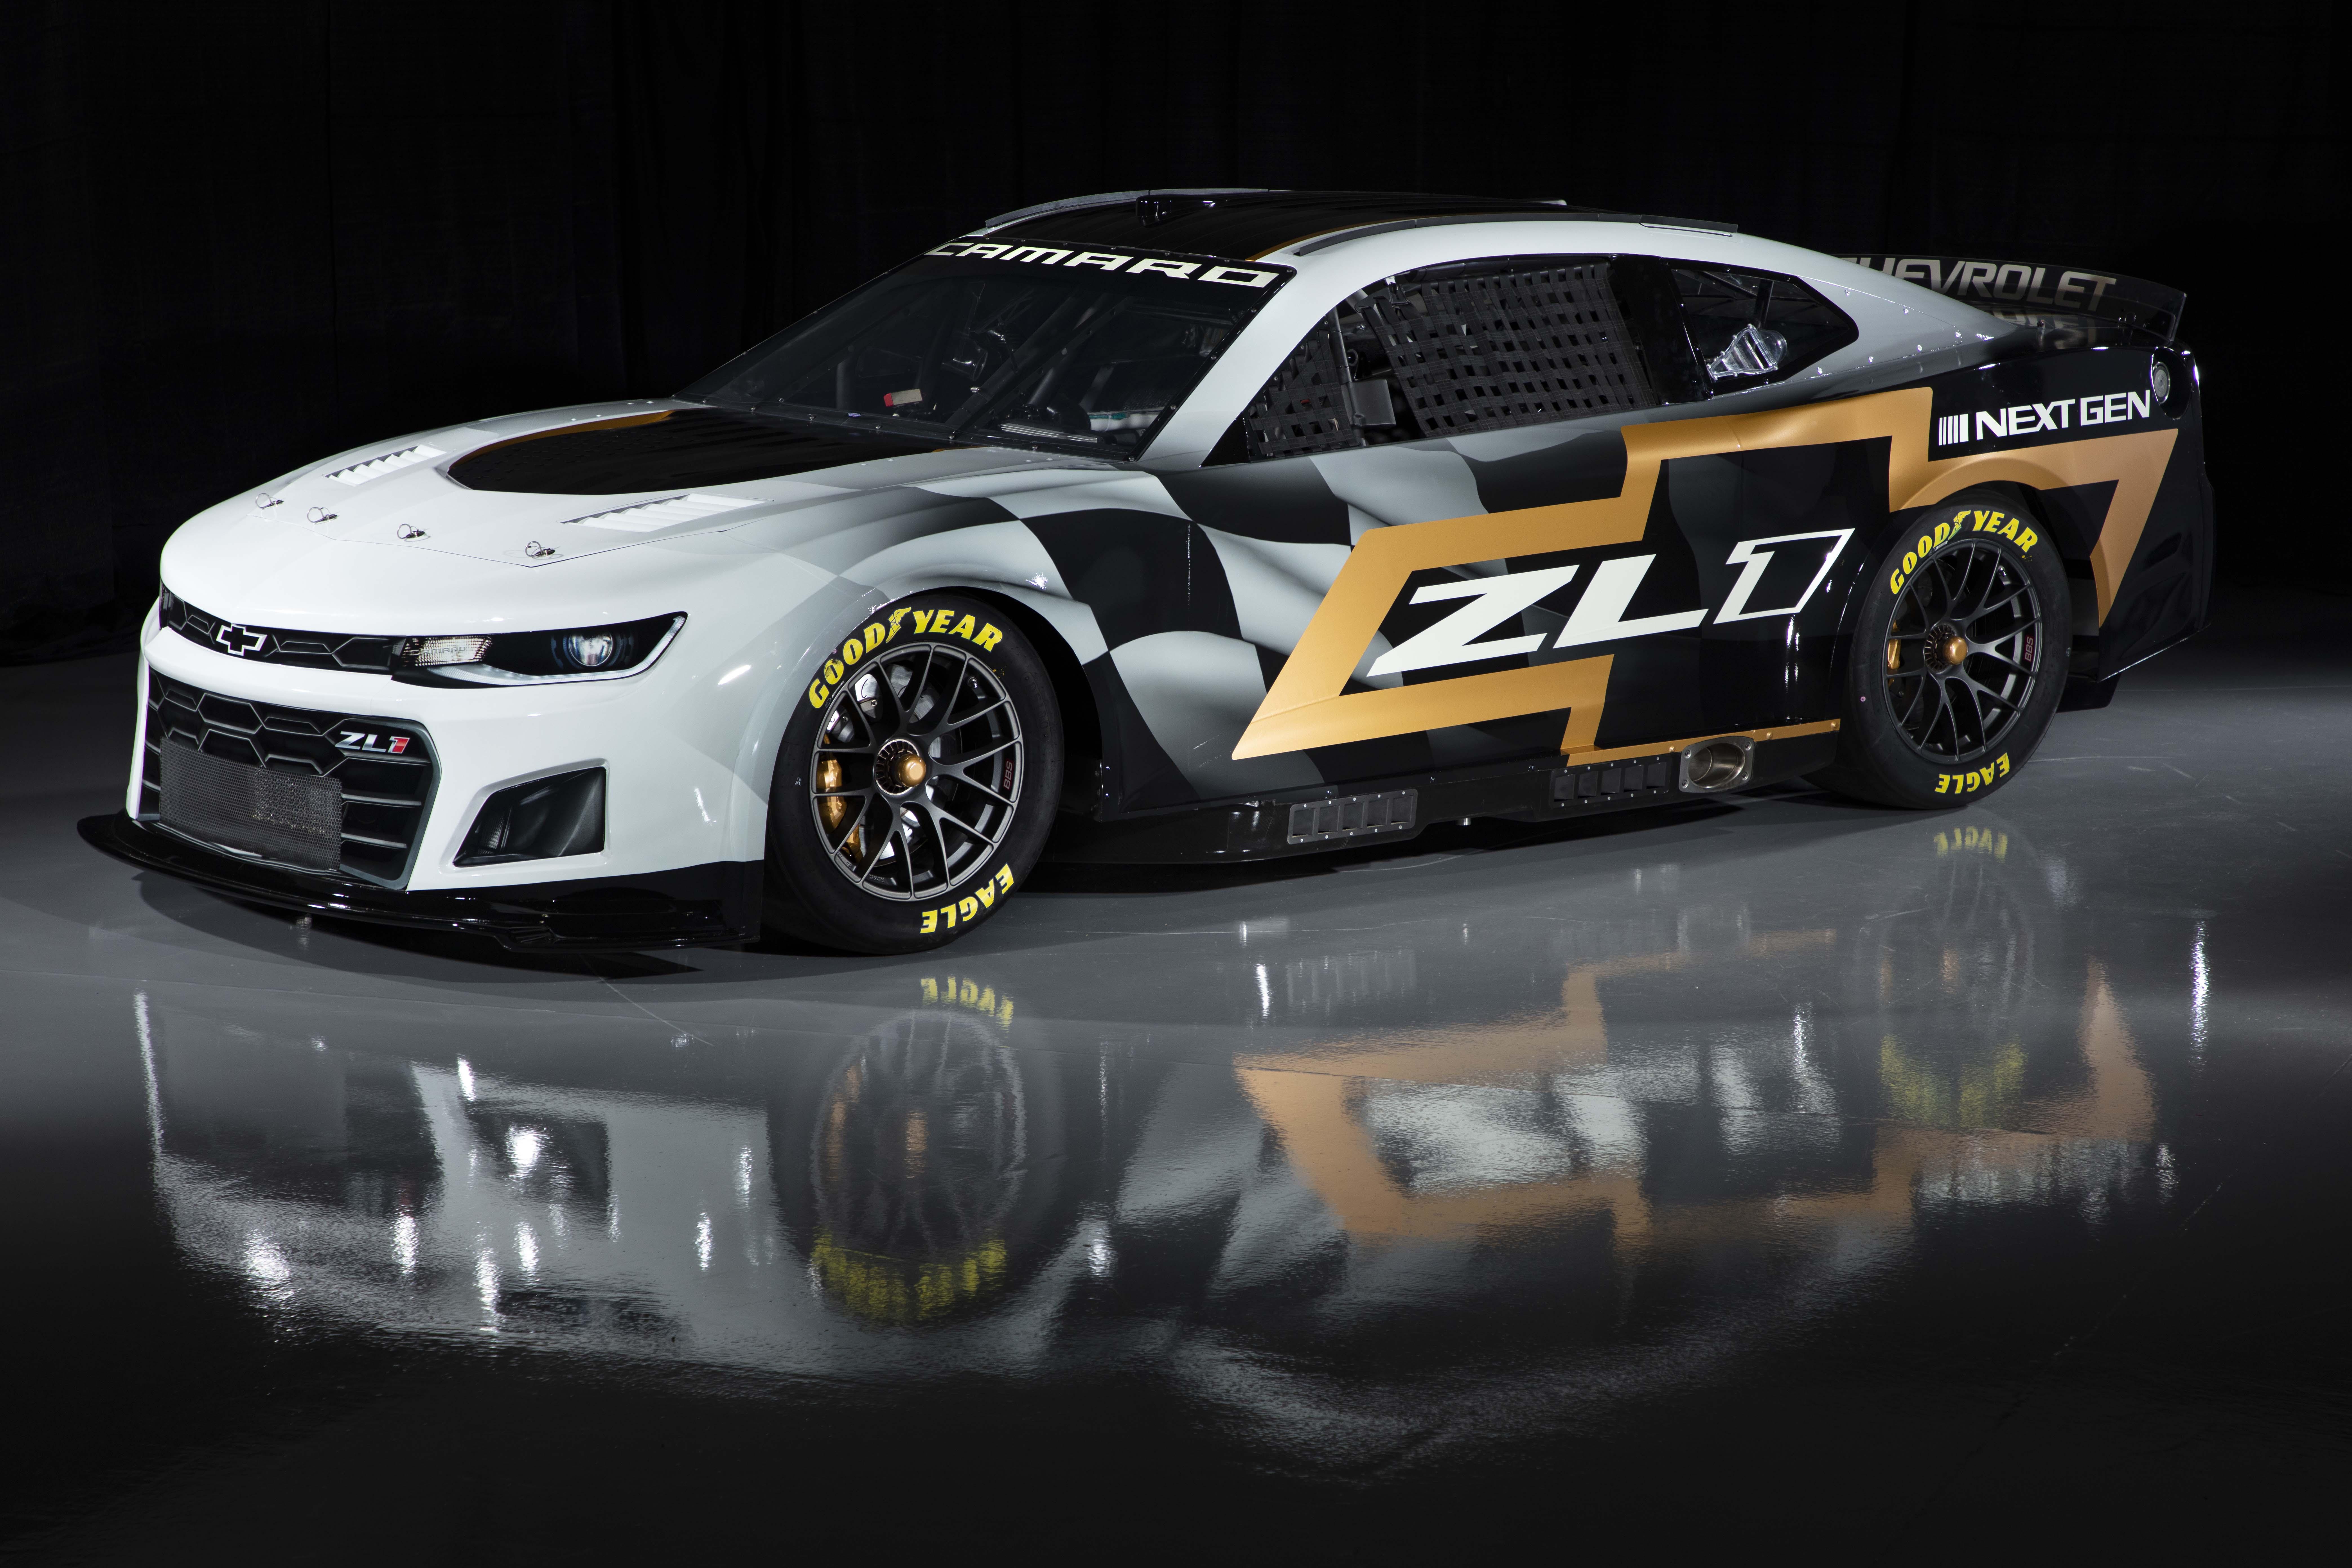 Chevrolet Camaro - 2022 Next Gen Car - Photo